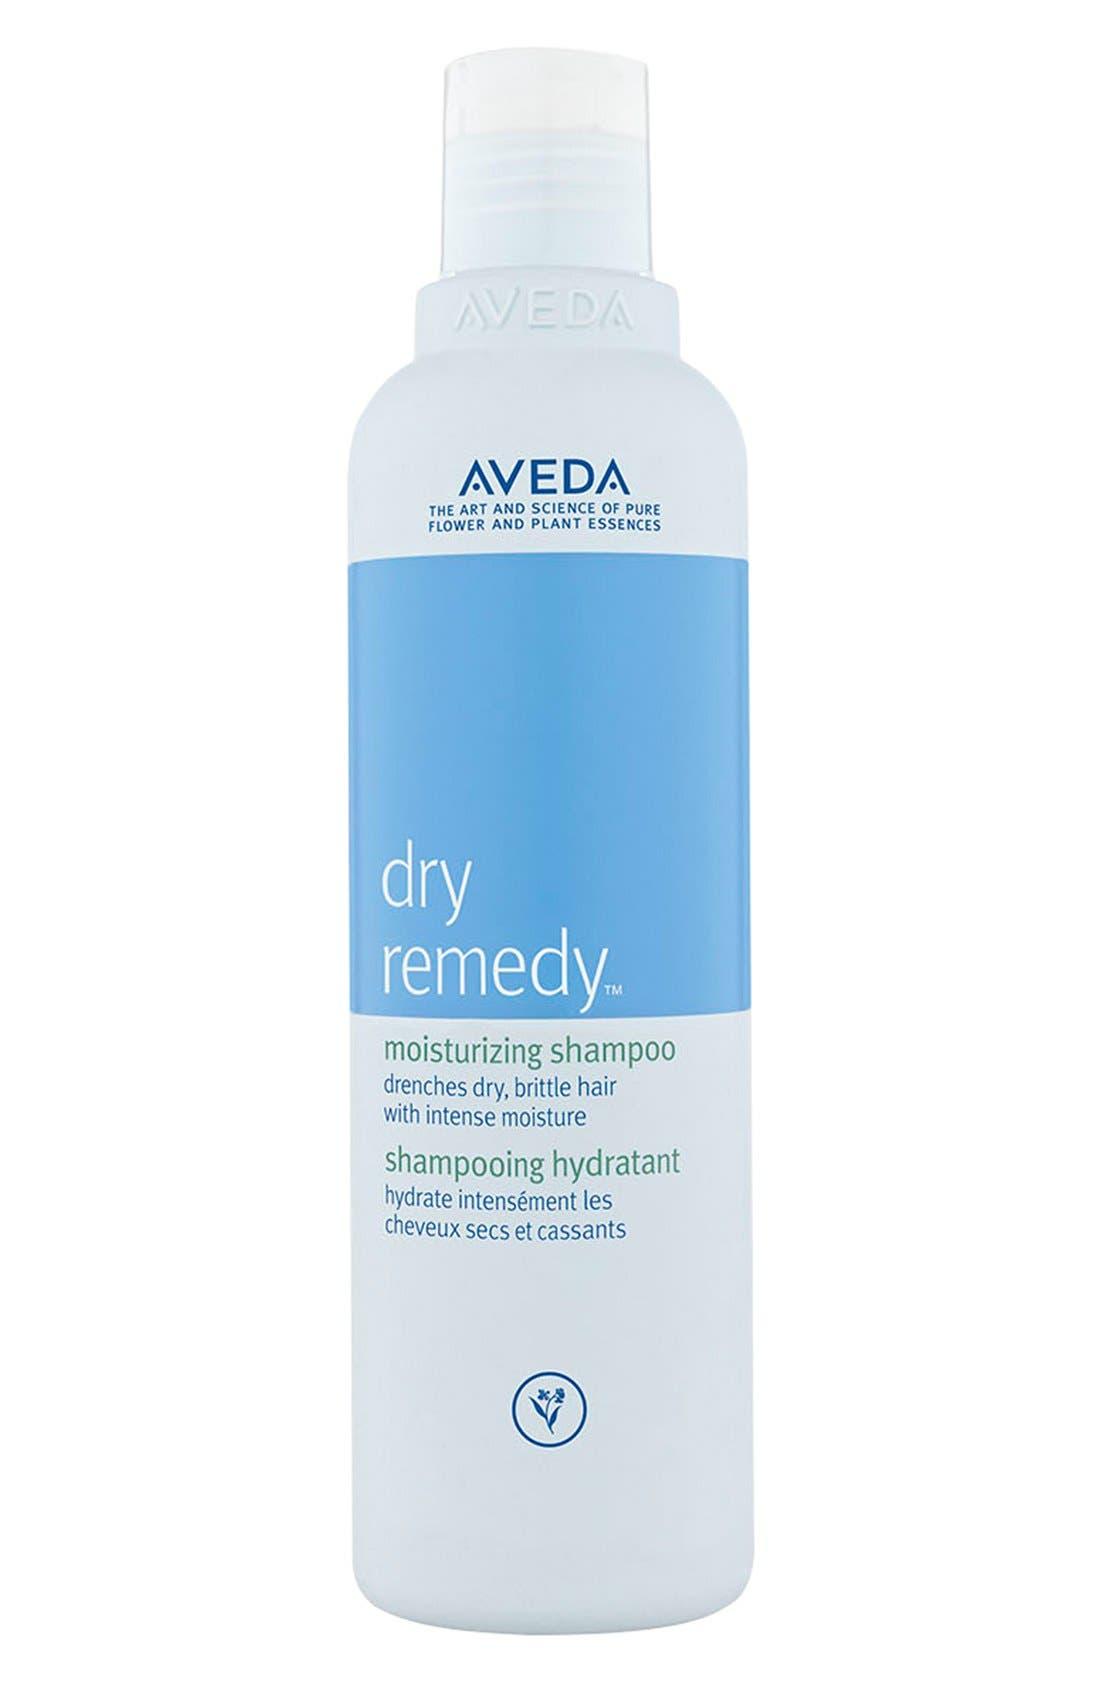 Dry Remedy(TM) Moisturizing Shampoo